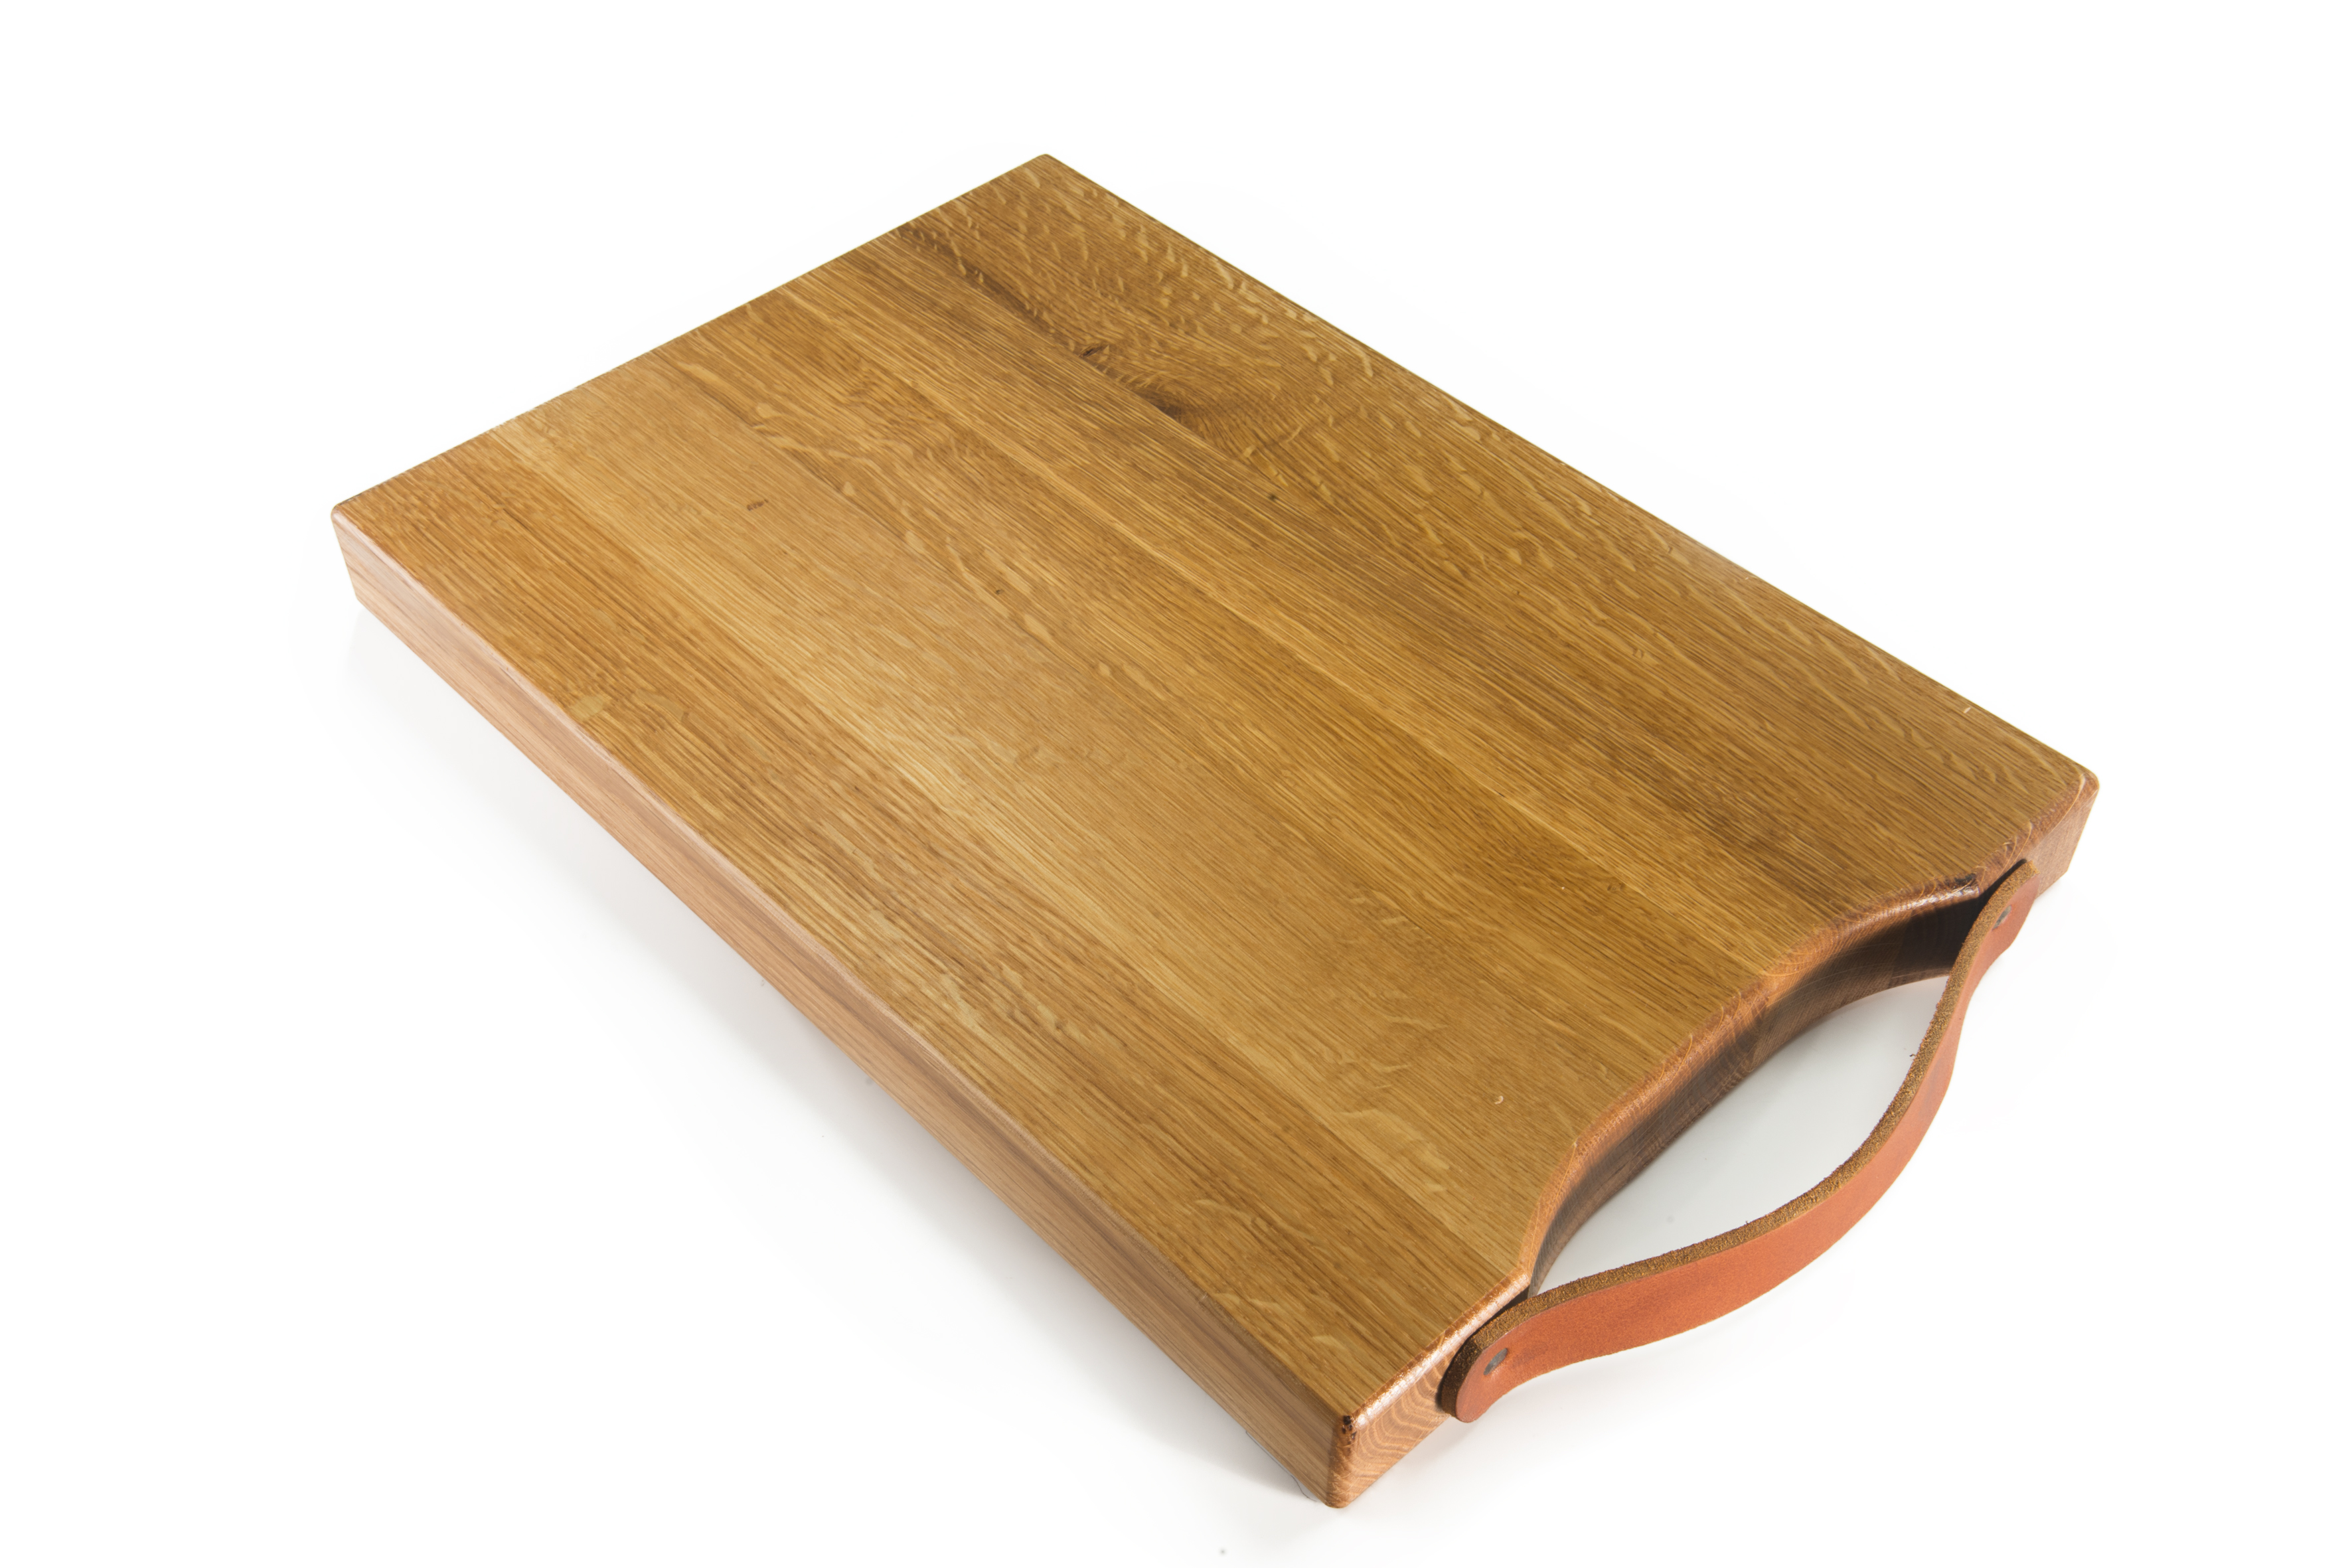 Cuttin block professionell 46 x 30 cm